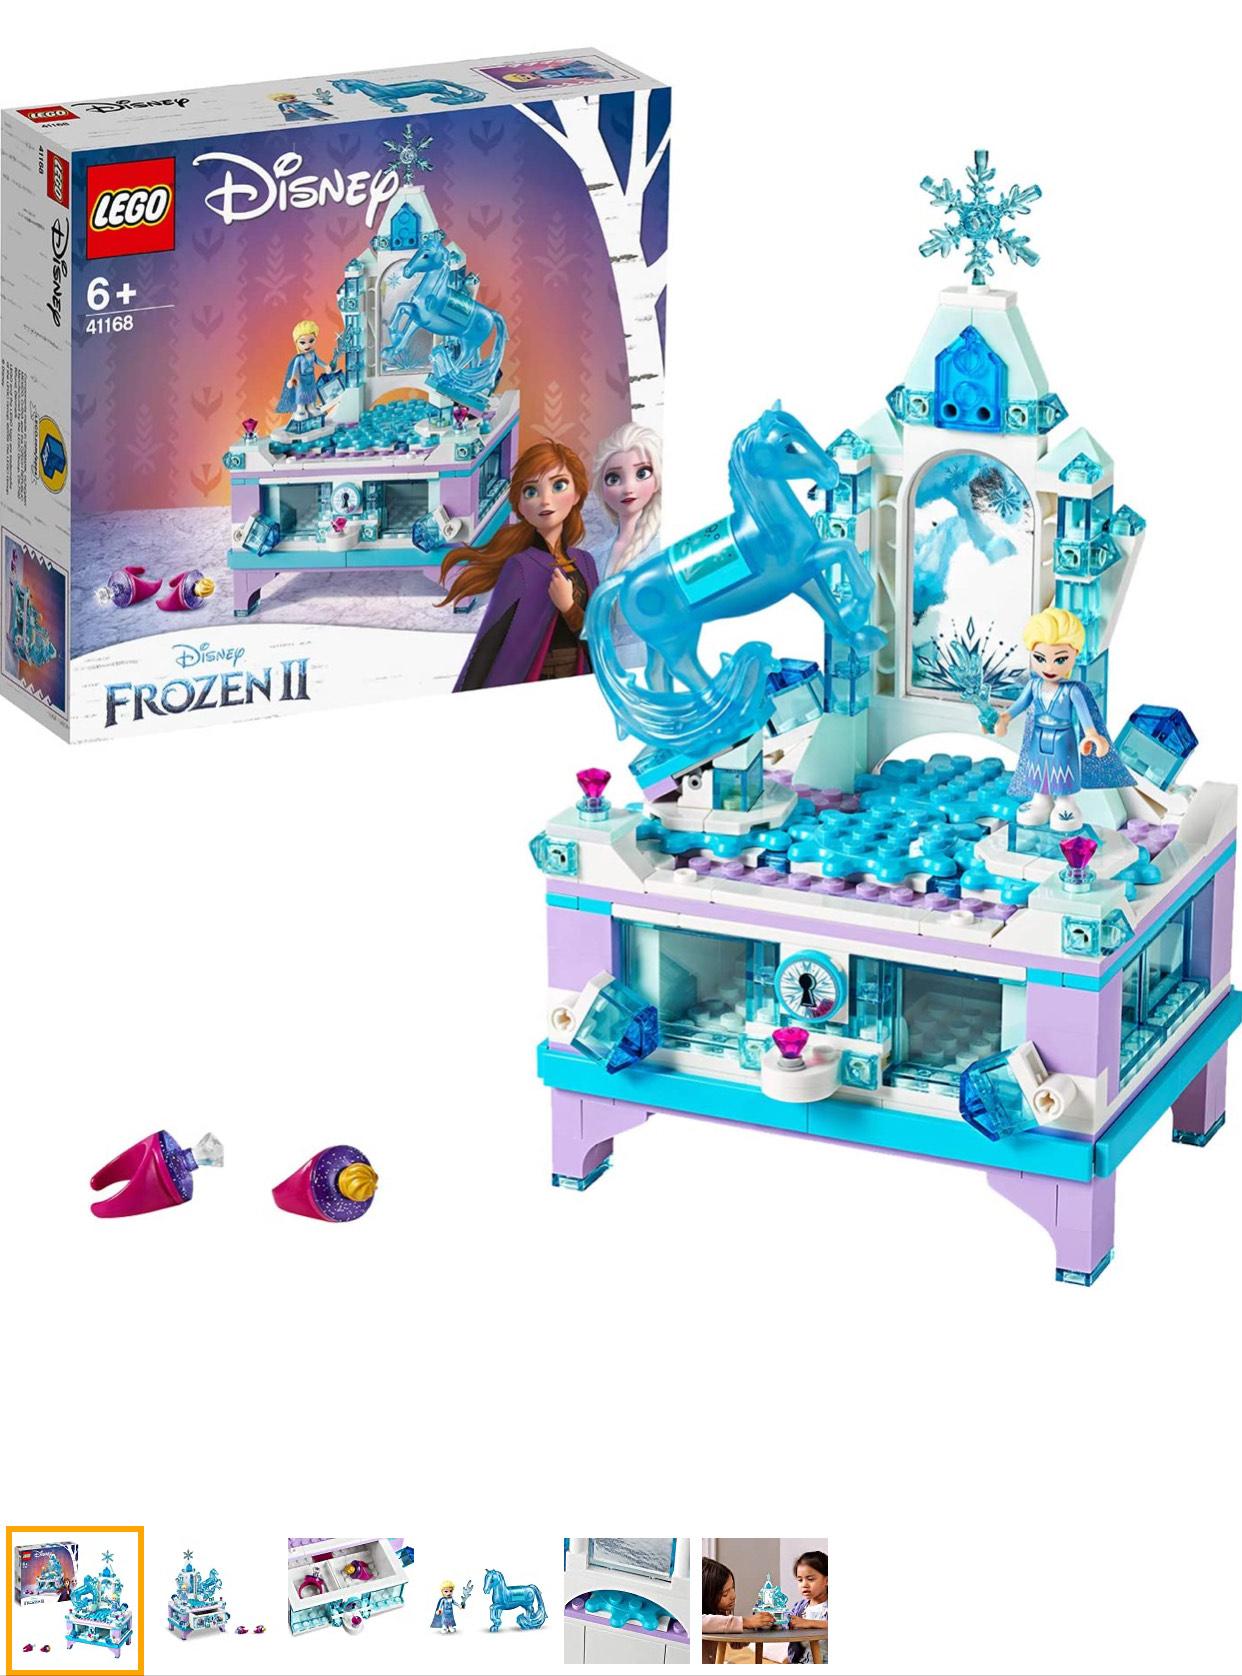 LEGO 41168 Disney Frozen II Elsa's Jewellery Box Creation with Princess Elsa Mini Doll and Nokk Figure @ Amazon (Prime Exclusive)